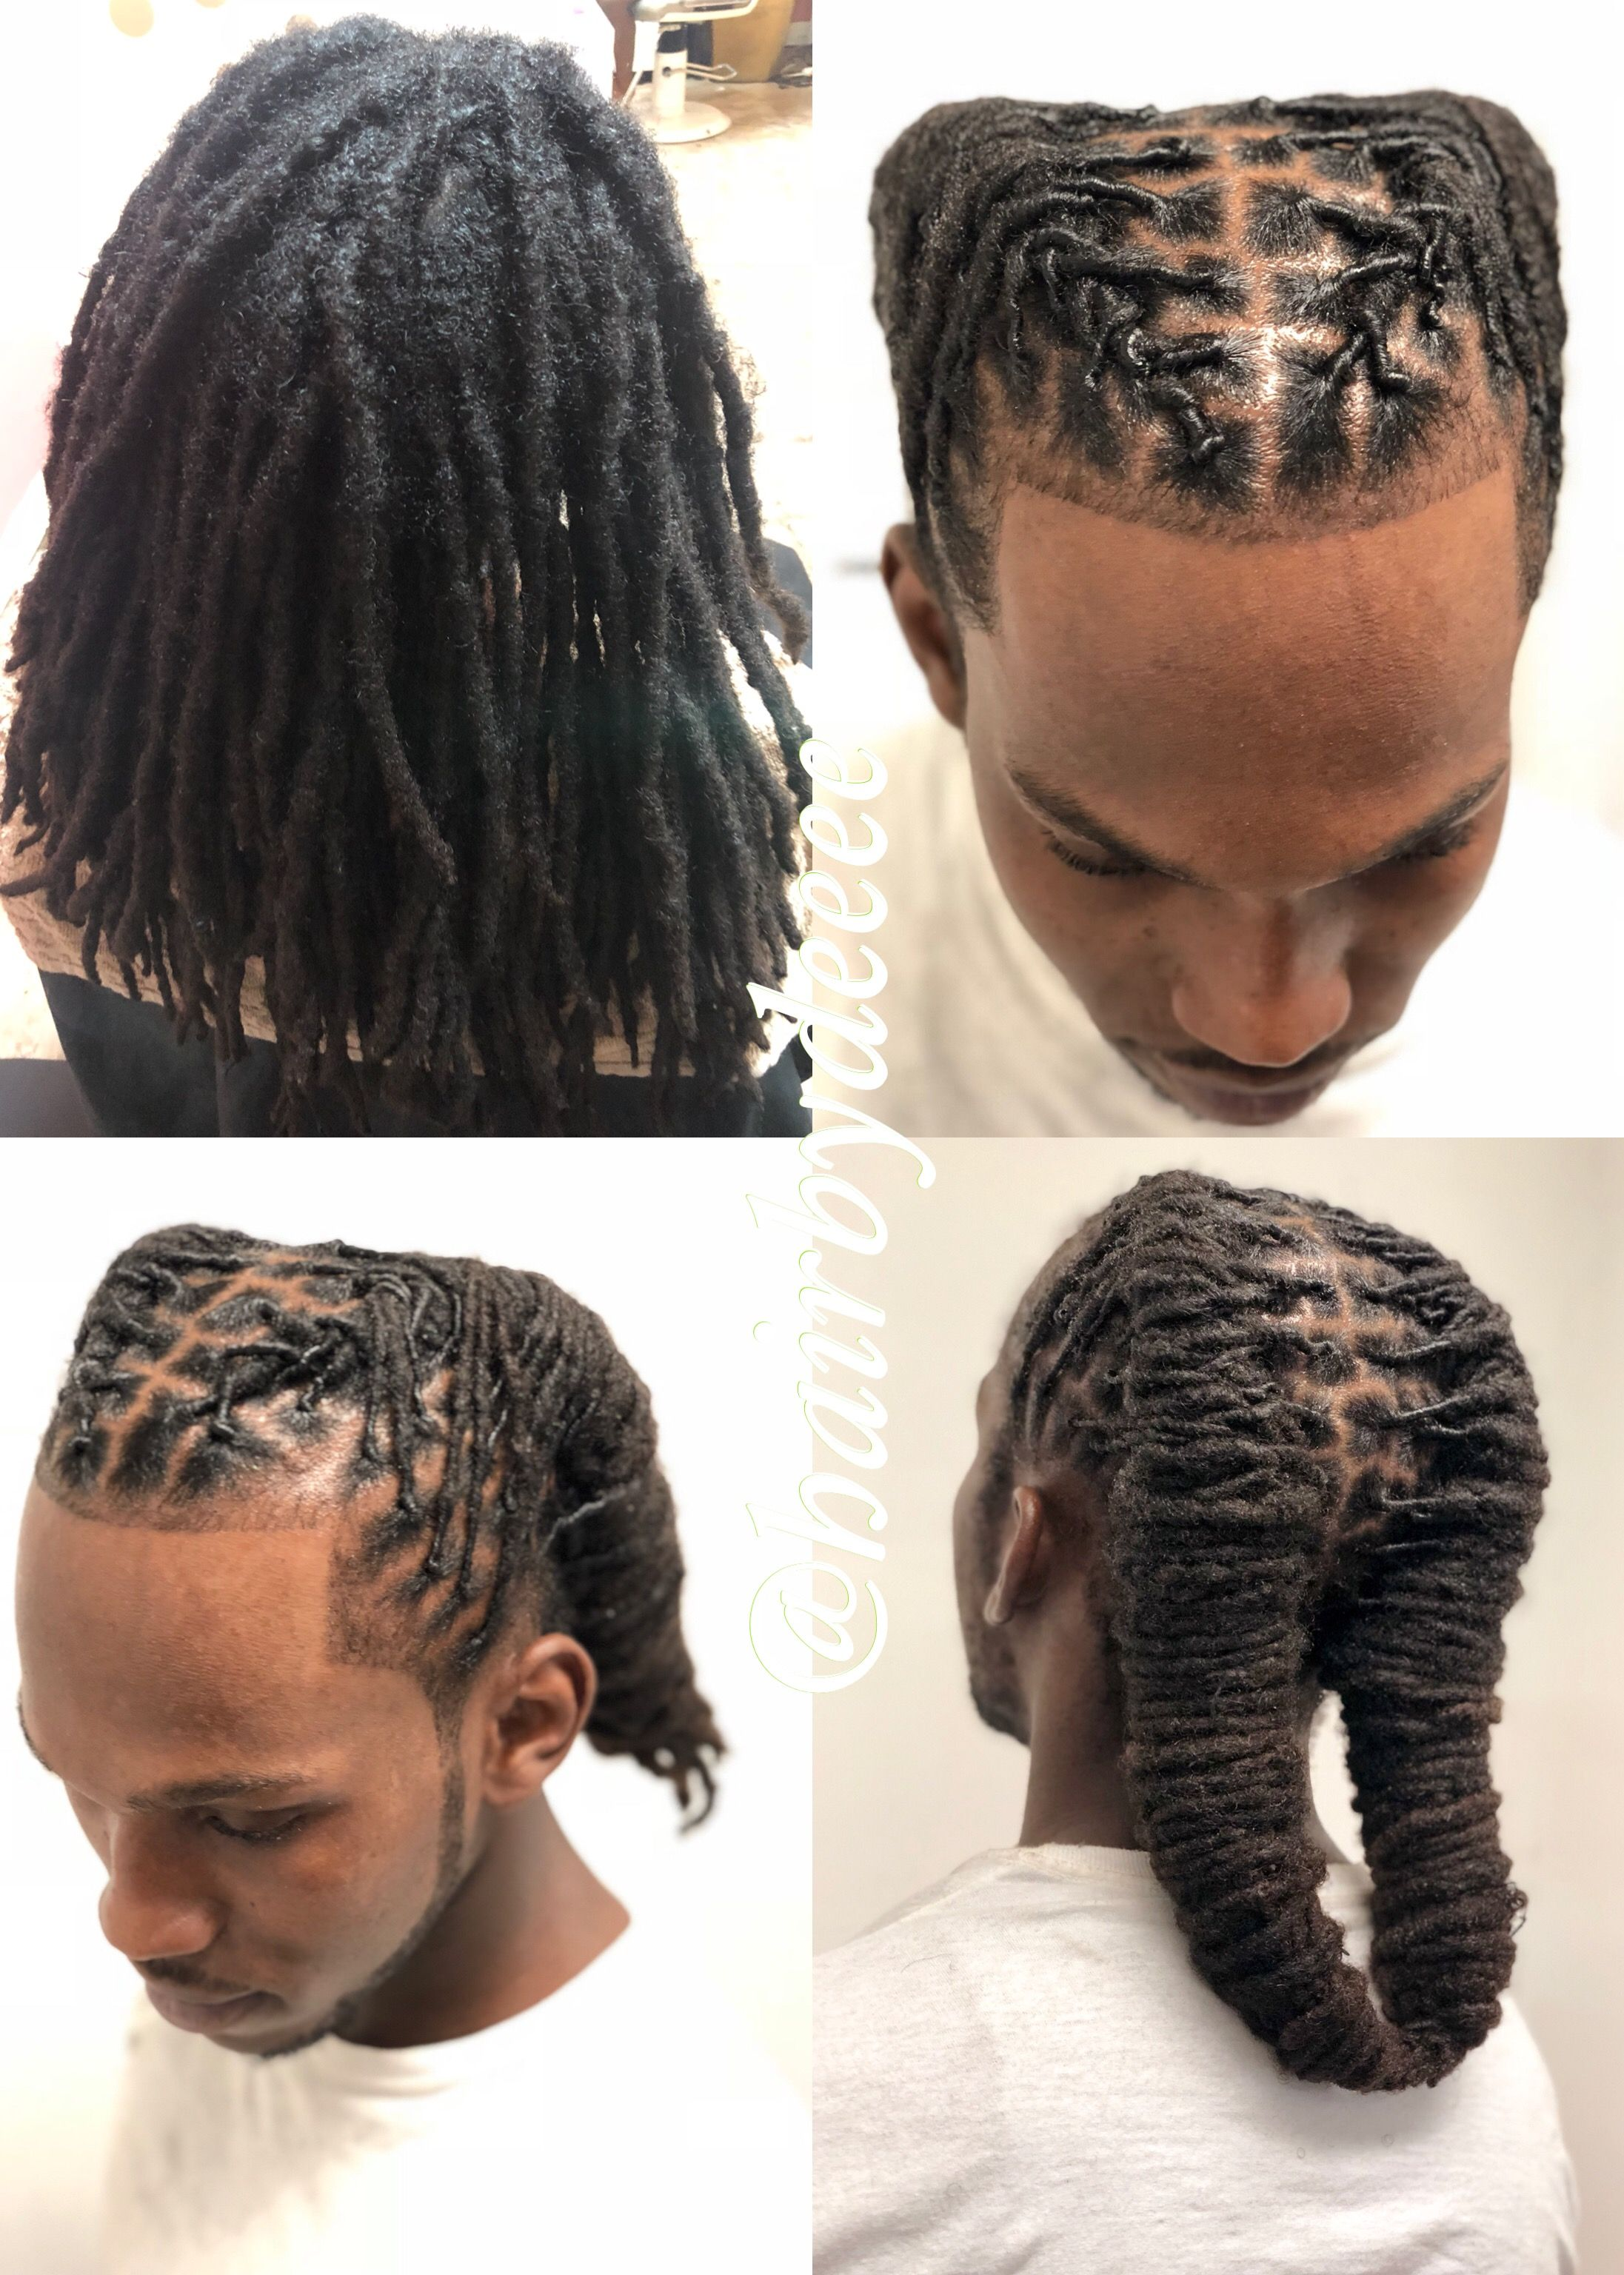 Dreads Styles For Men Dreads Style For Men In 2019